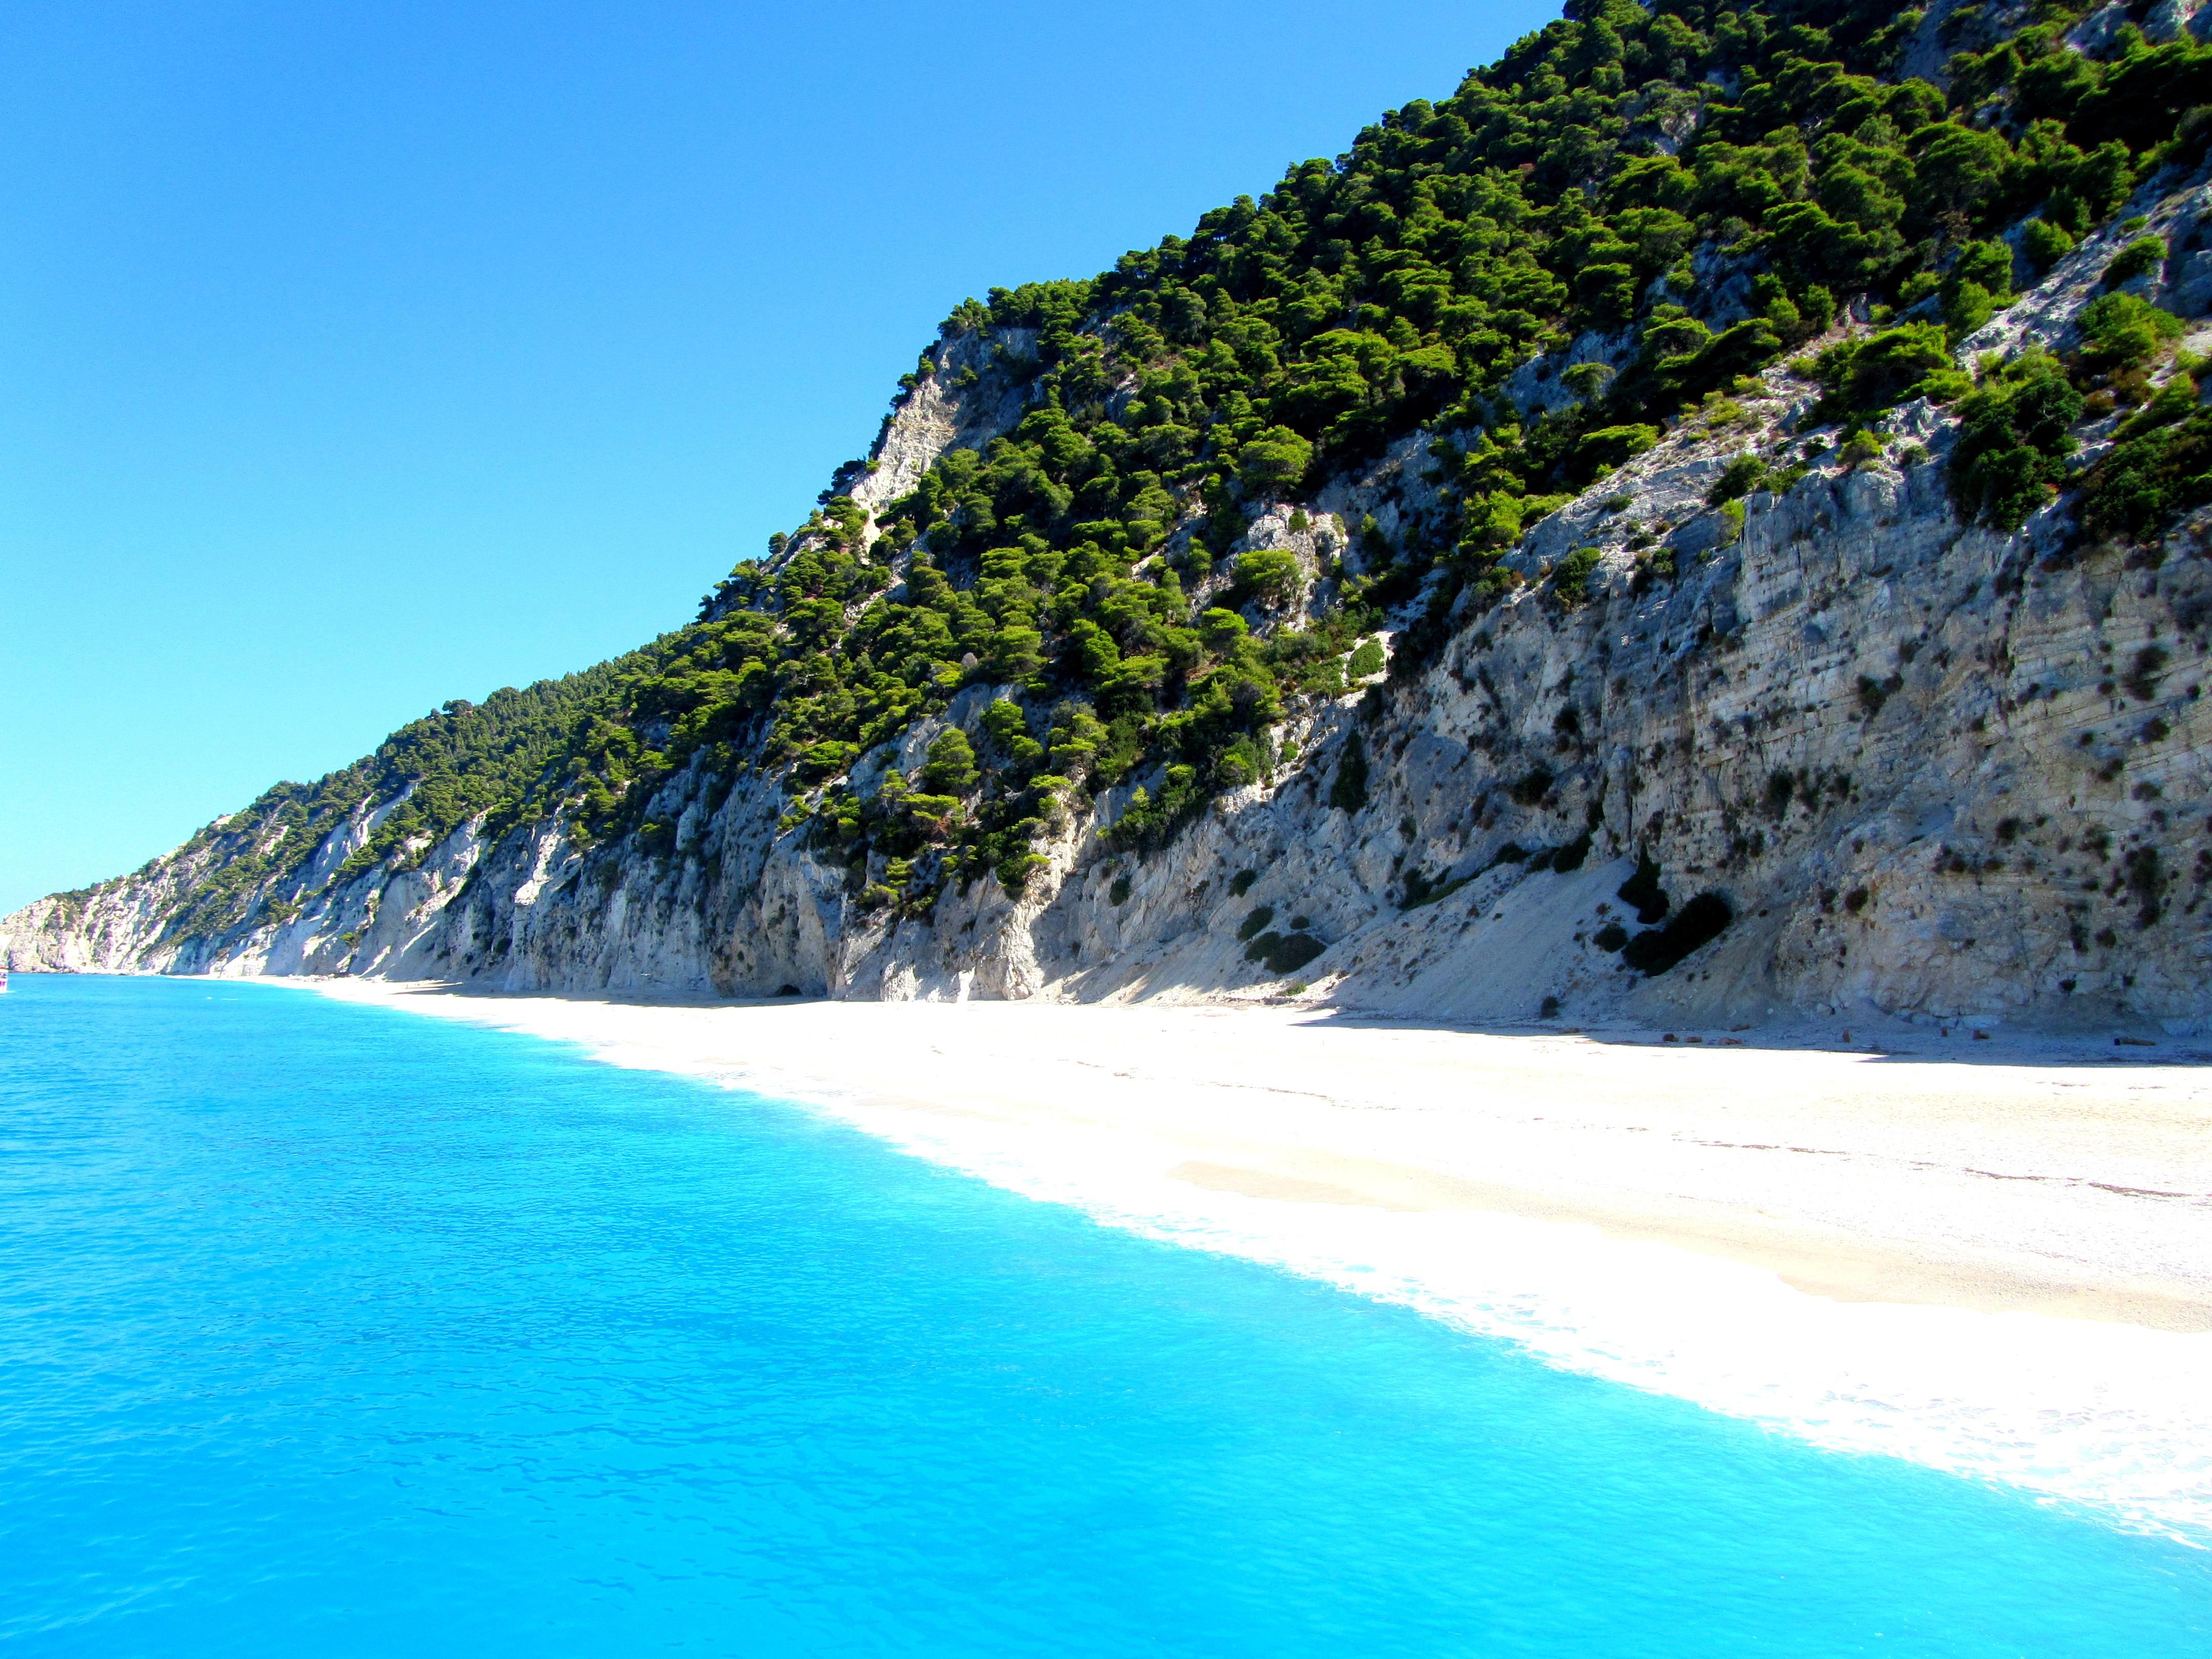 Greek beaches ranked among world's best | protothemanews.com